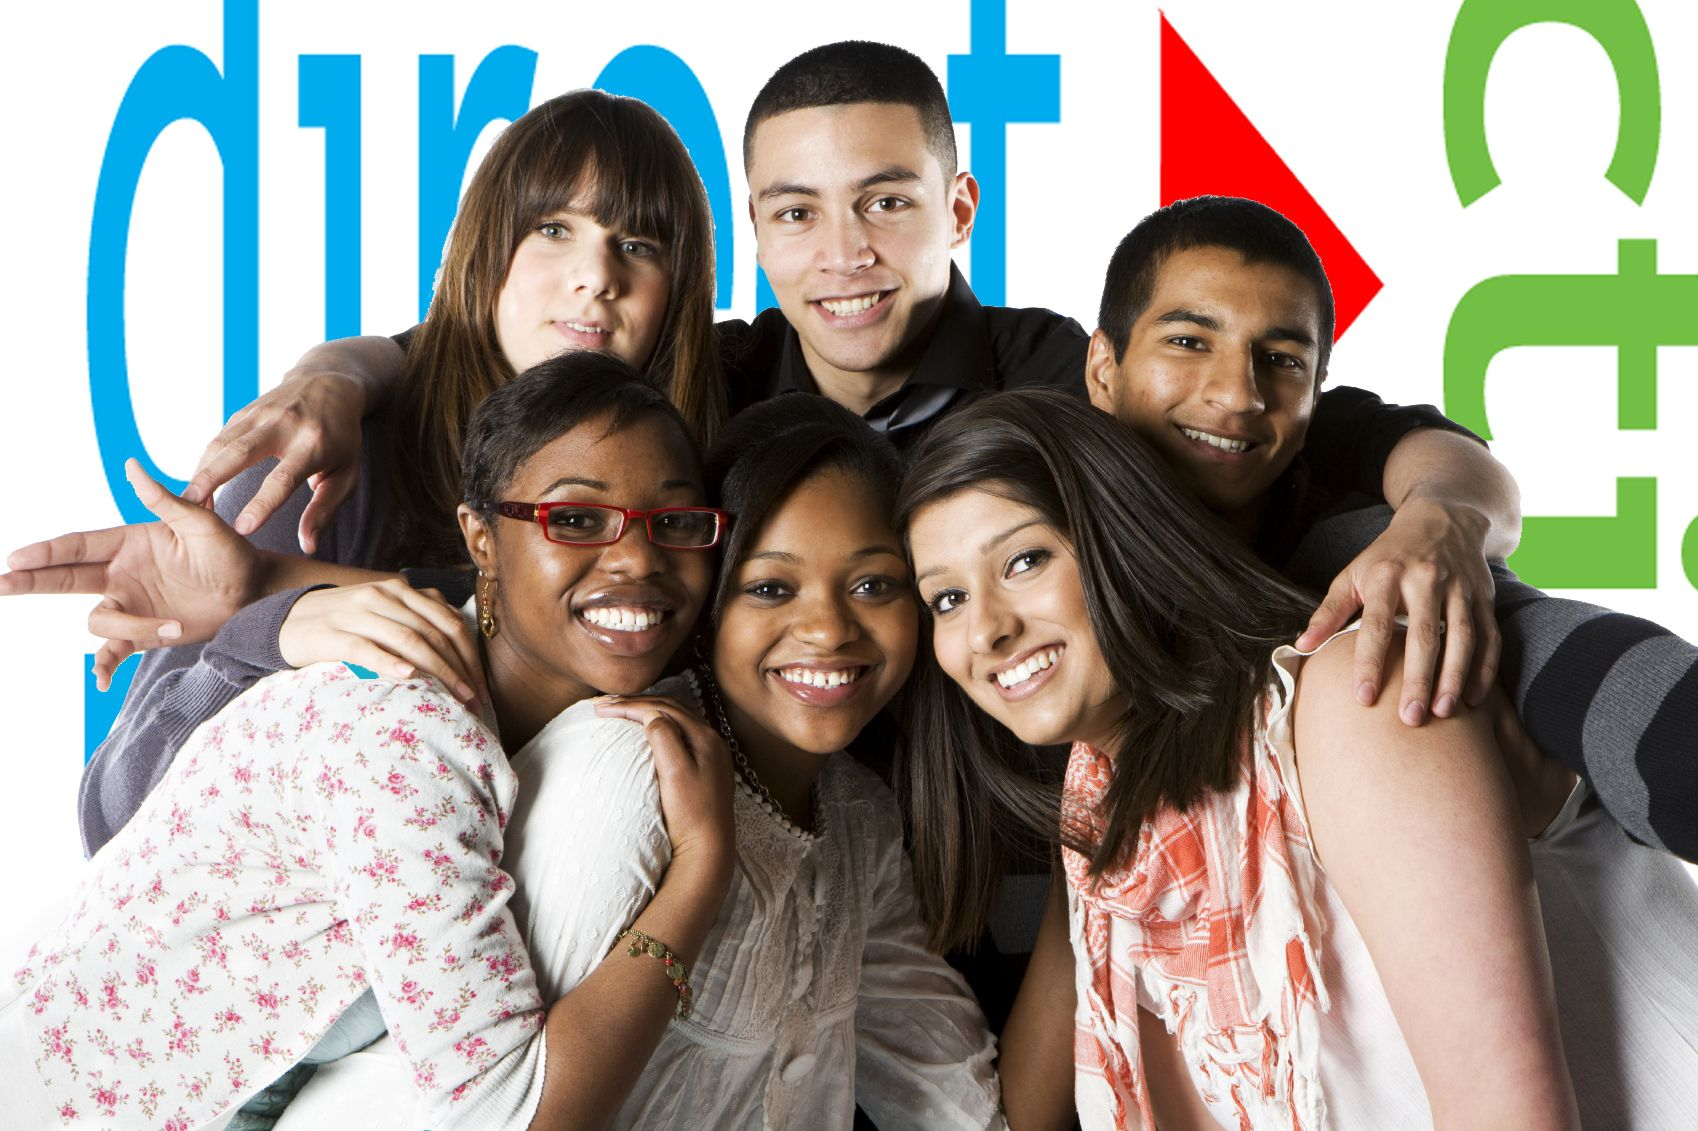 Christian interracial dating kostenlos